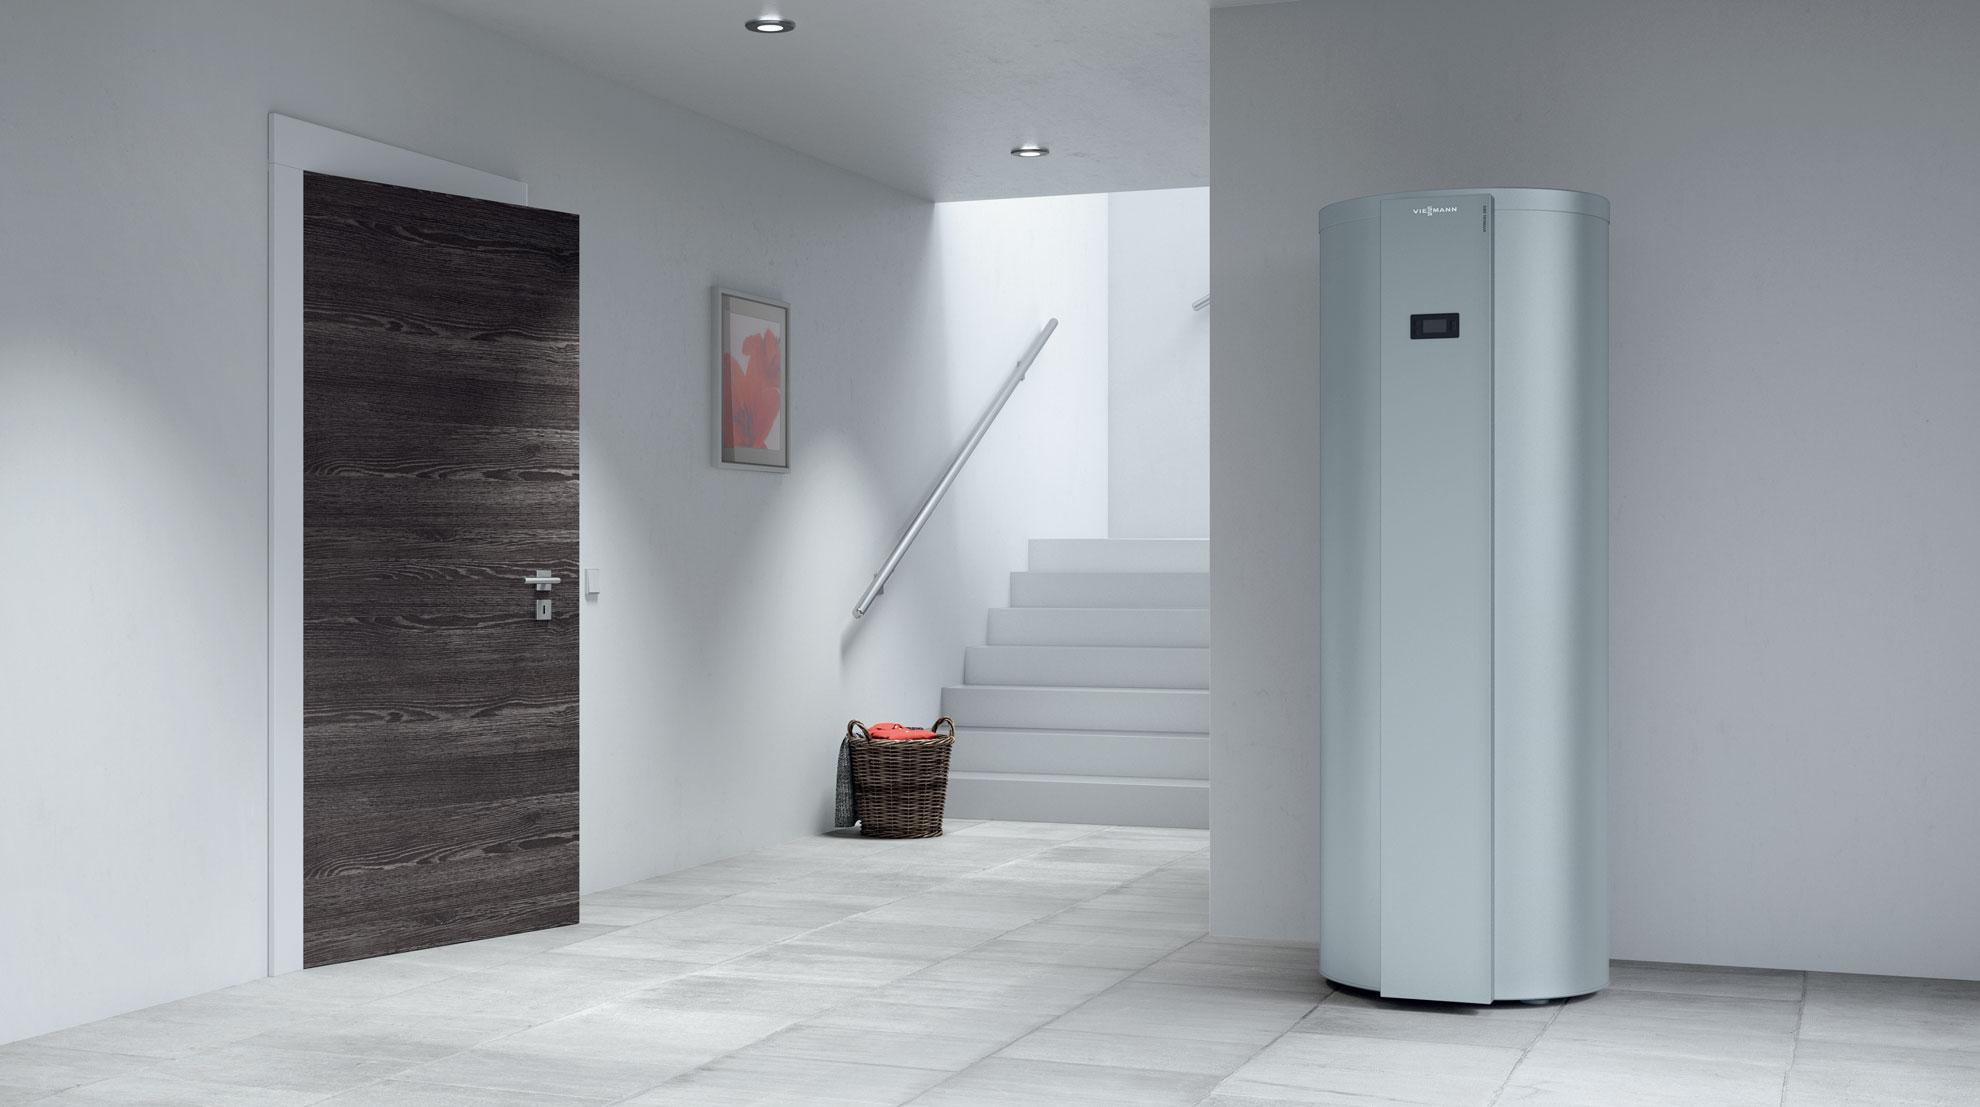 Pompa Di Calore Per Bagno pompa di calore per acqua calda sanitaria: è efficiente?